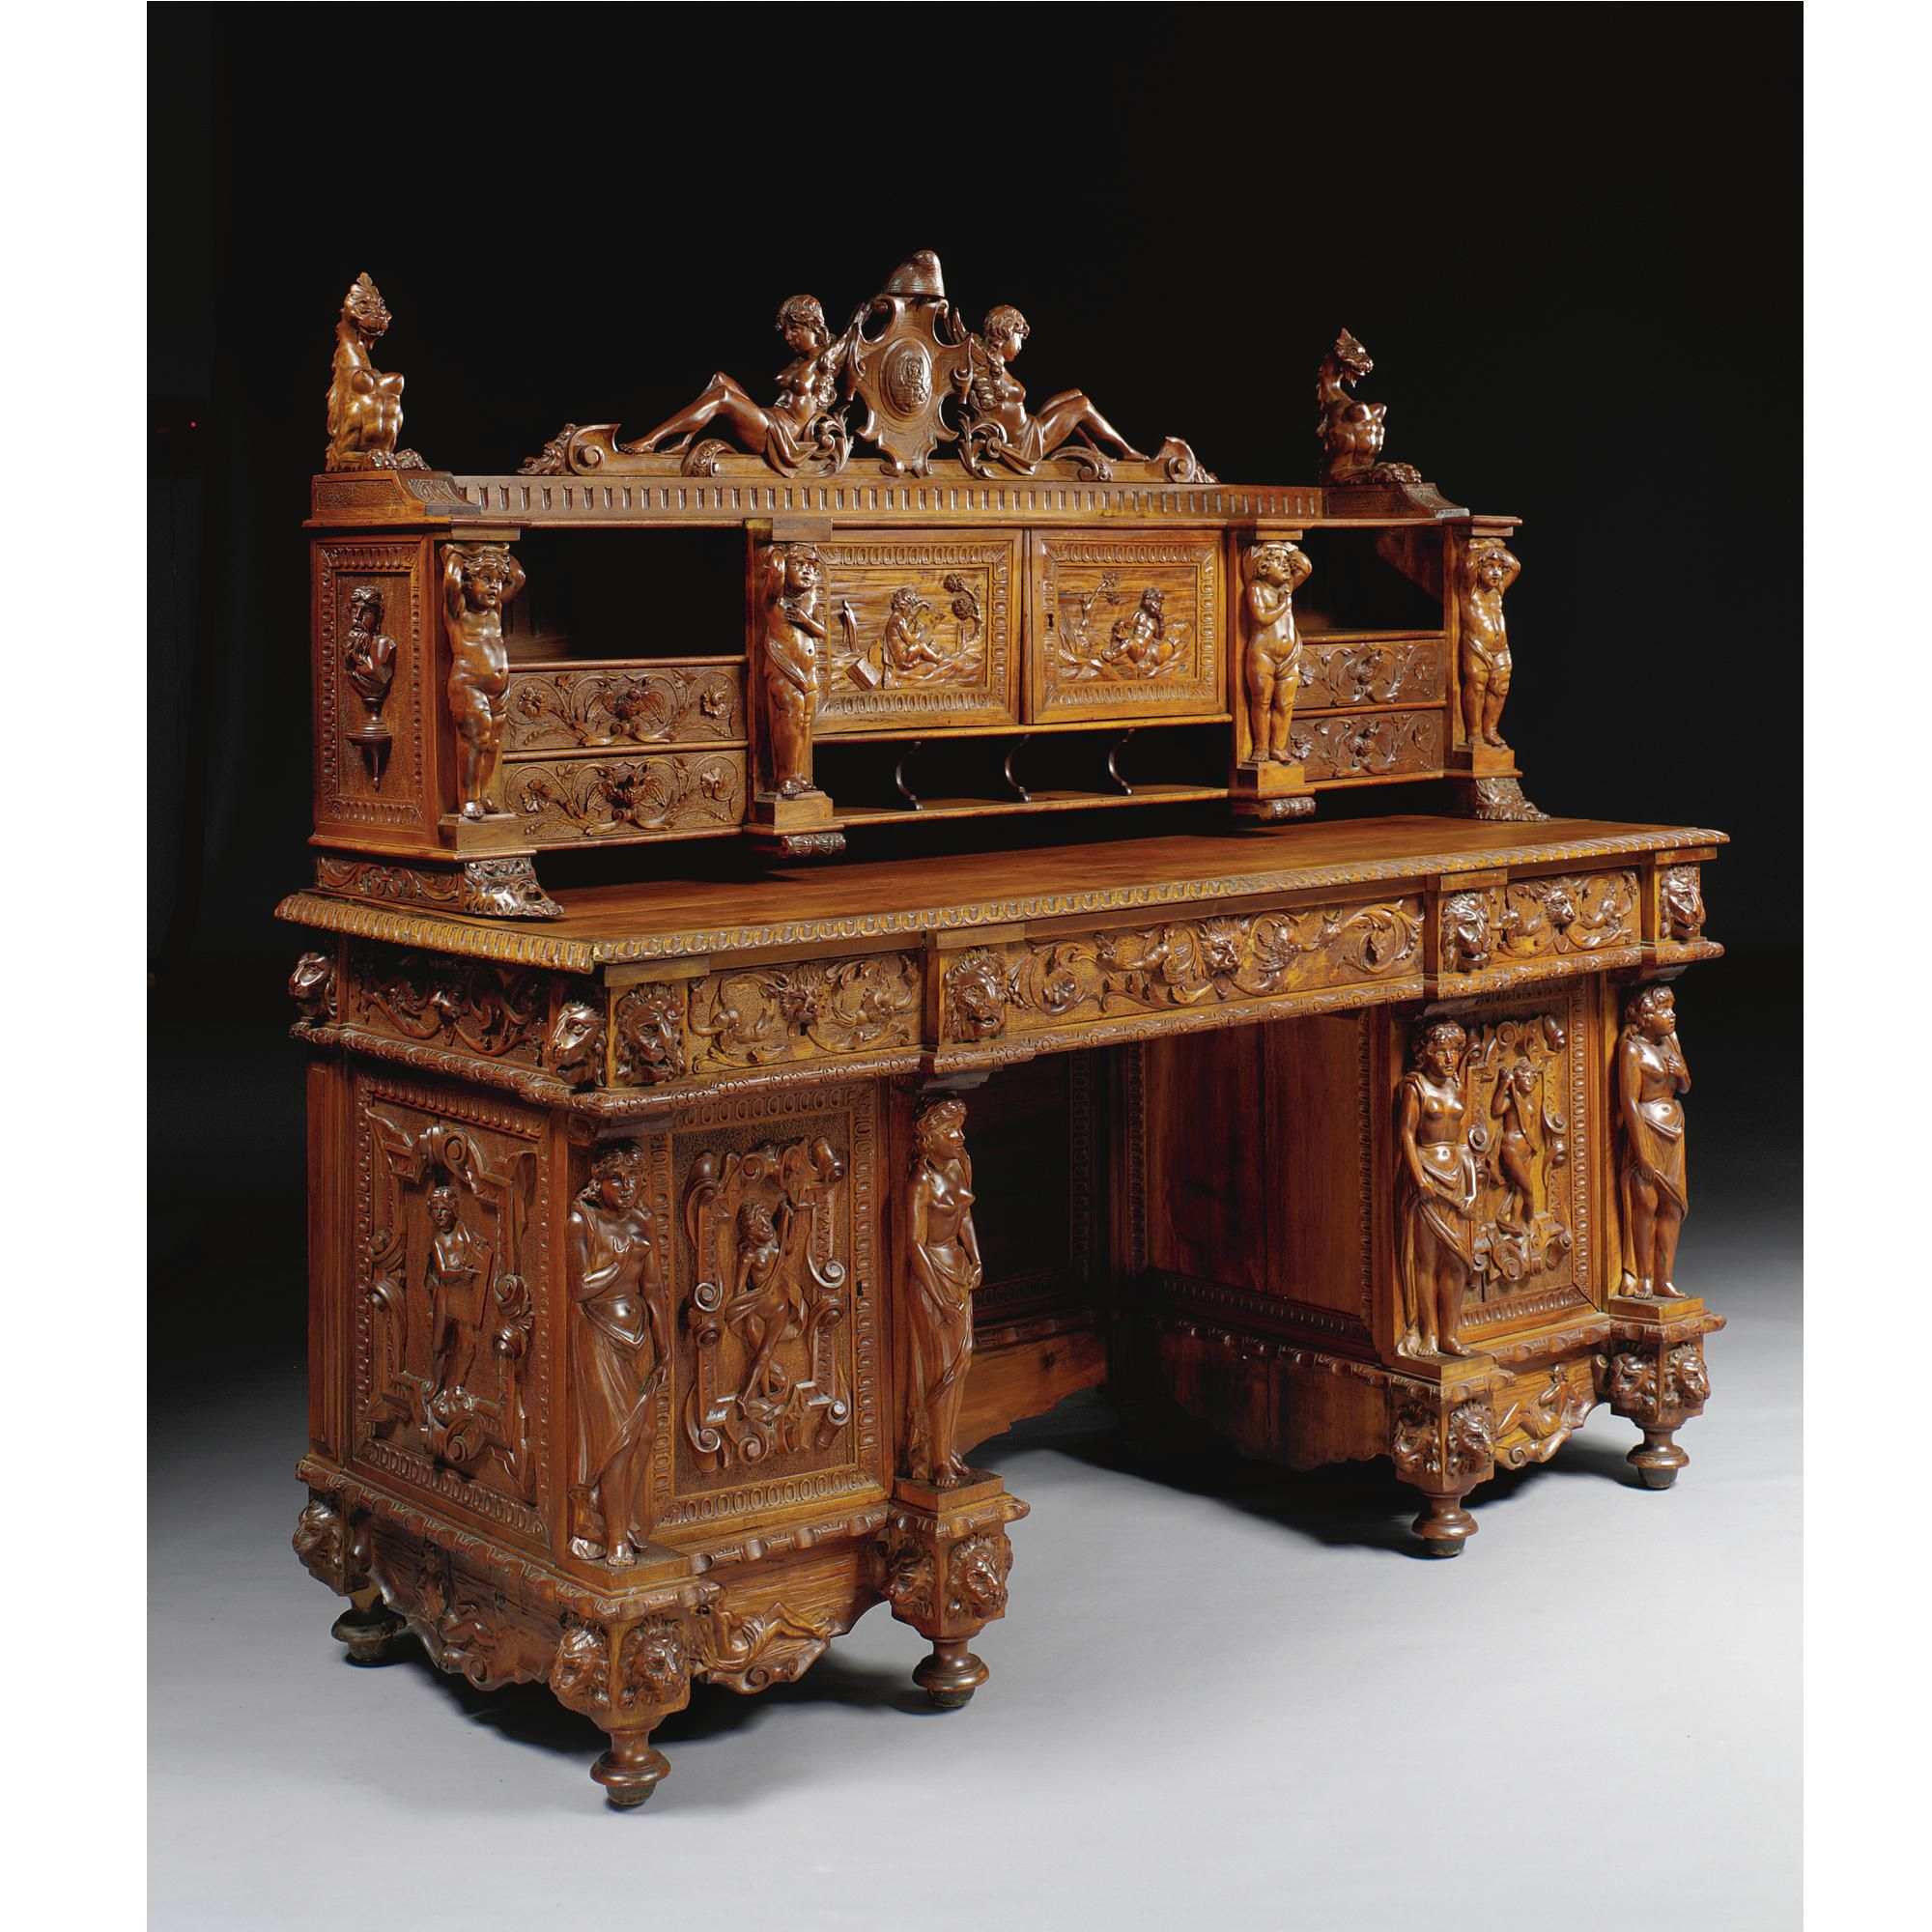 A North Italian Carved Walnut Desk Early 20th Century